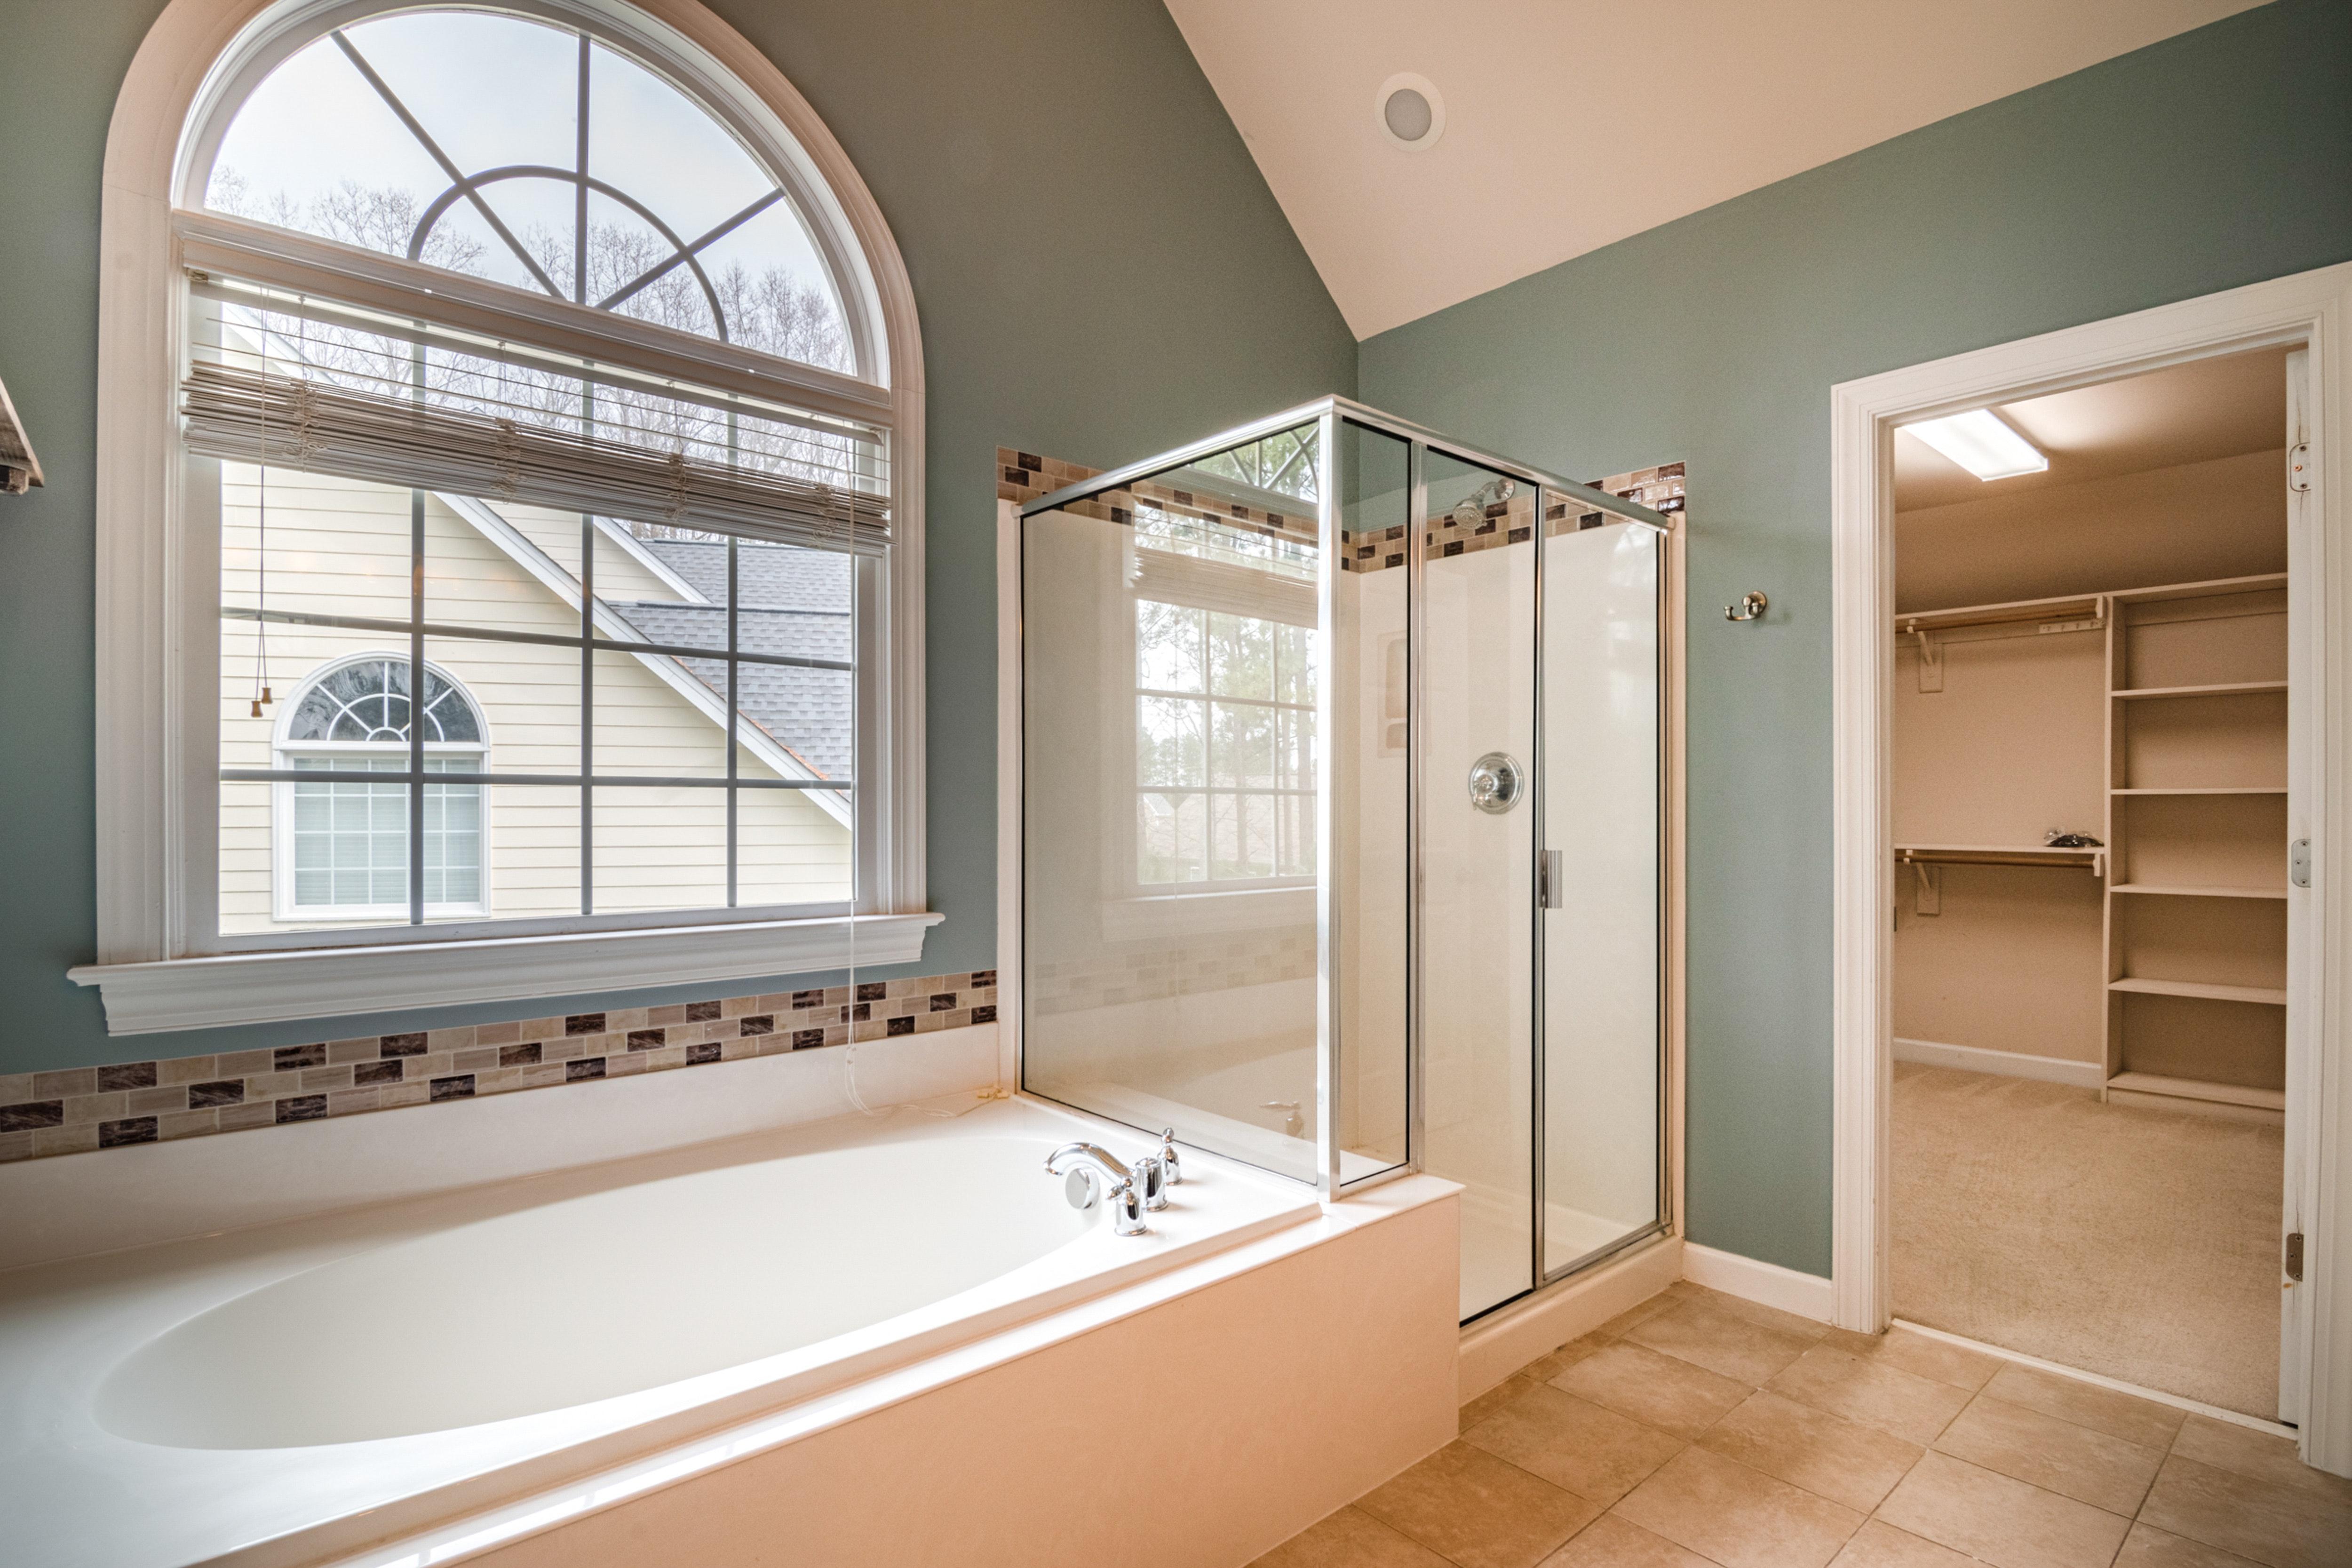 Bathroom renovation mistakes to avoid